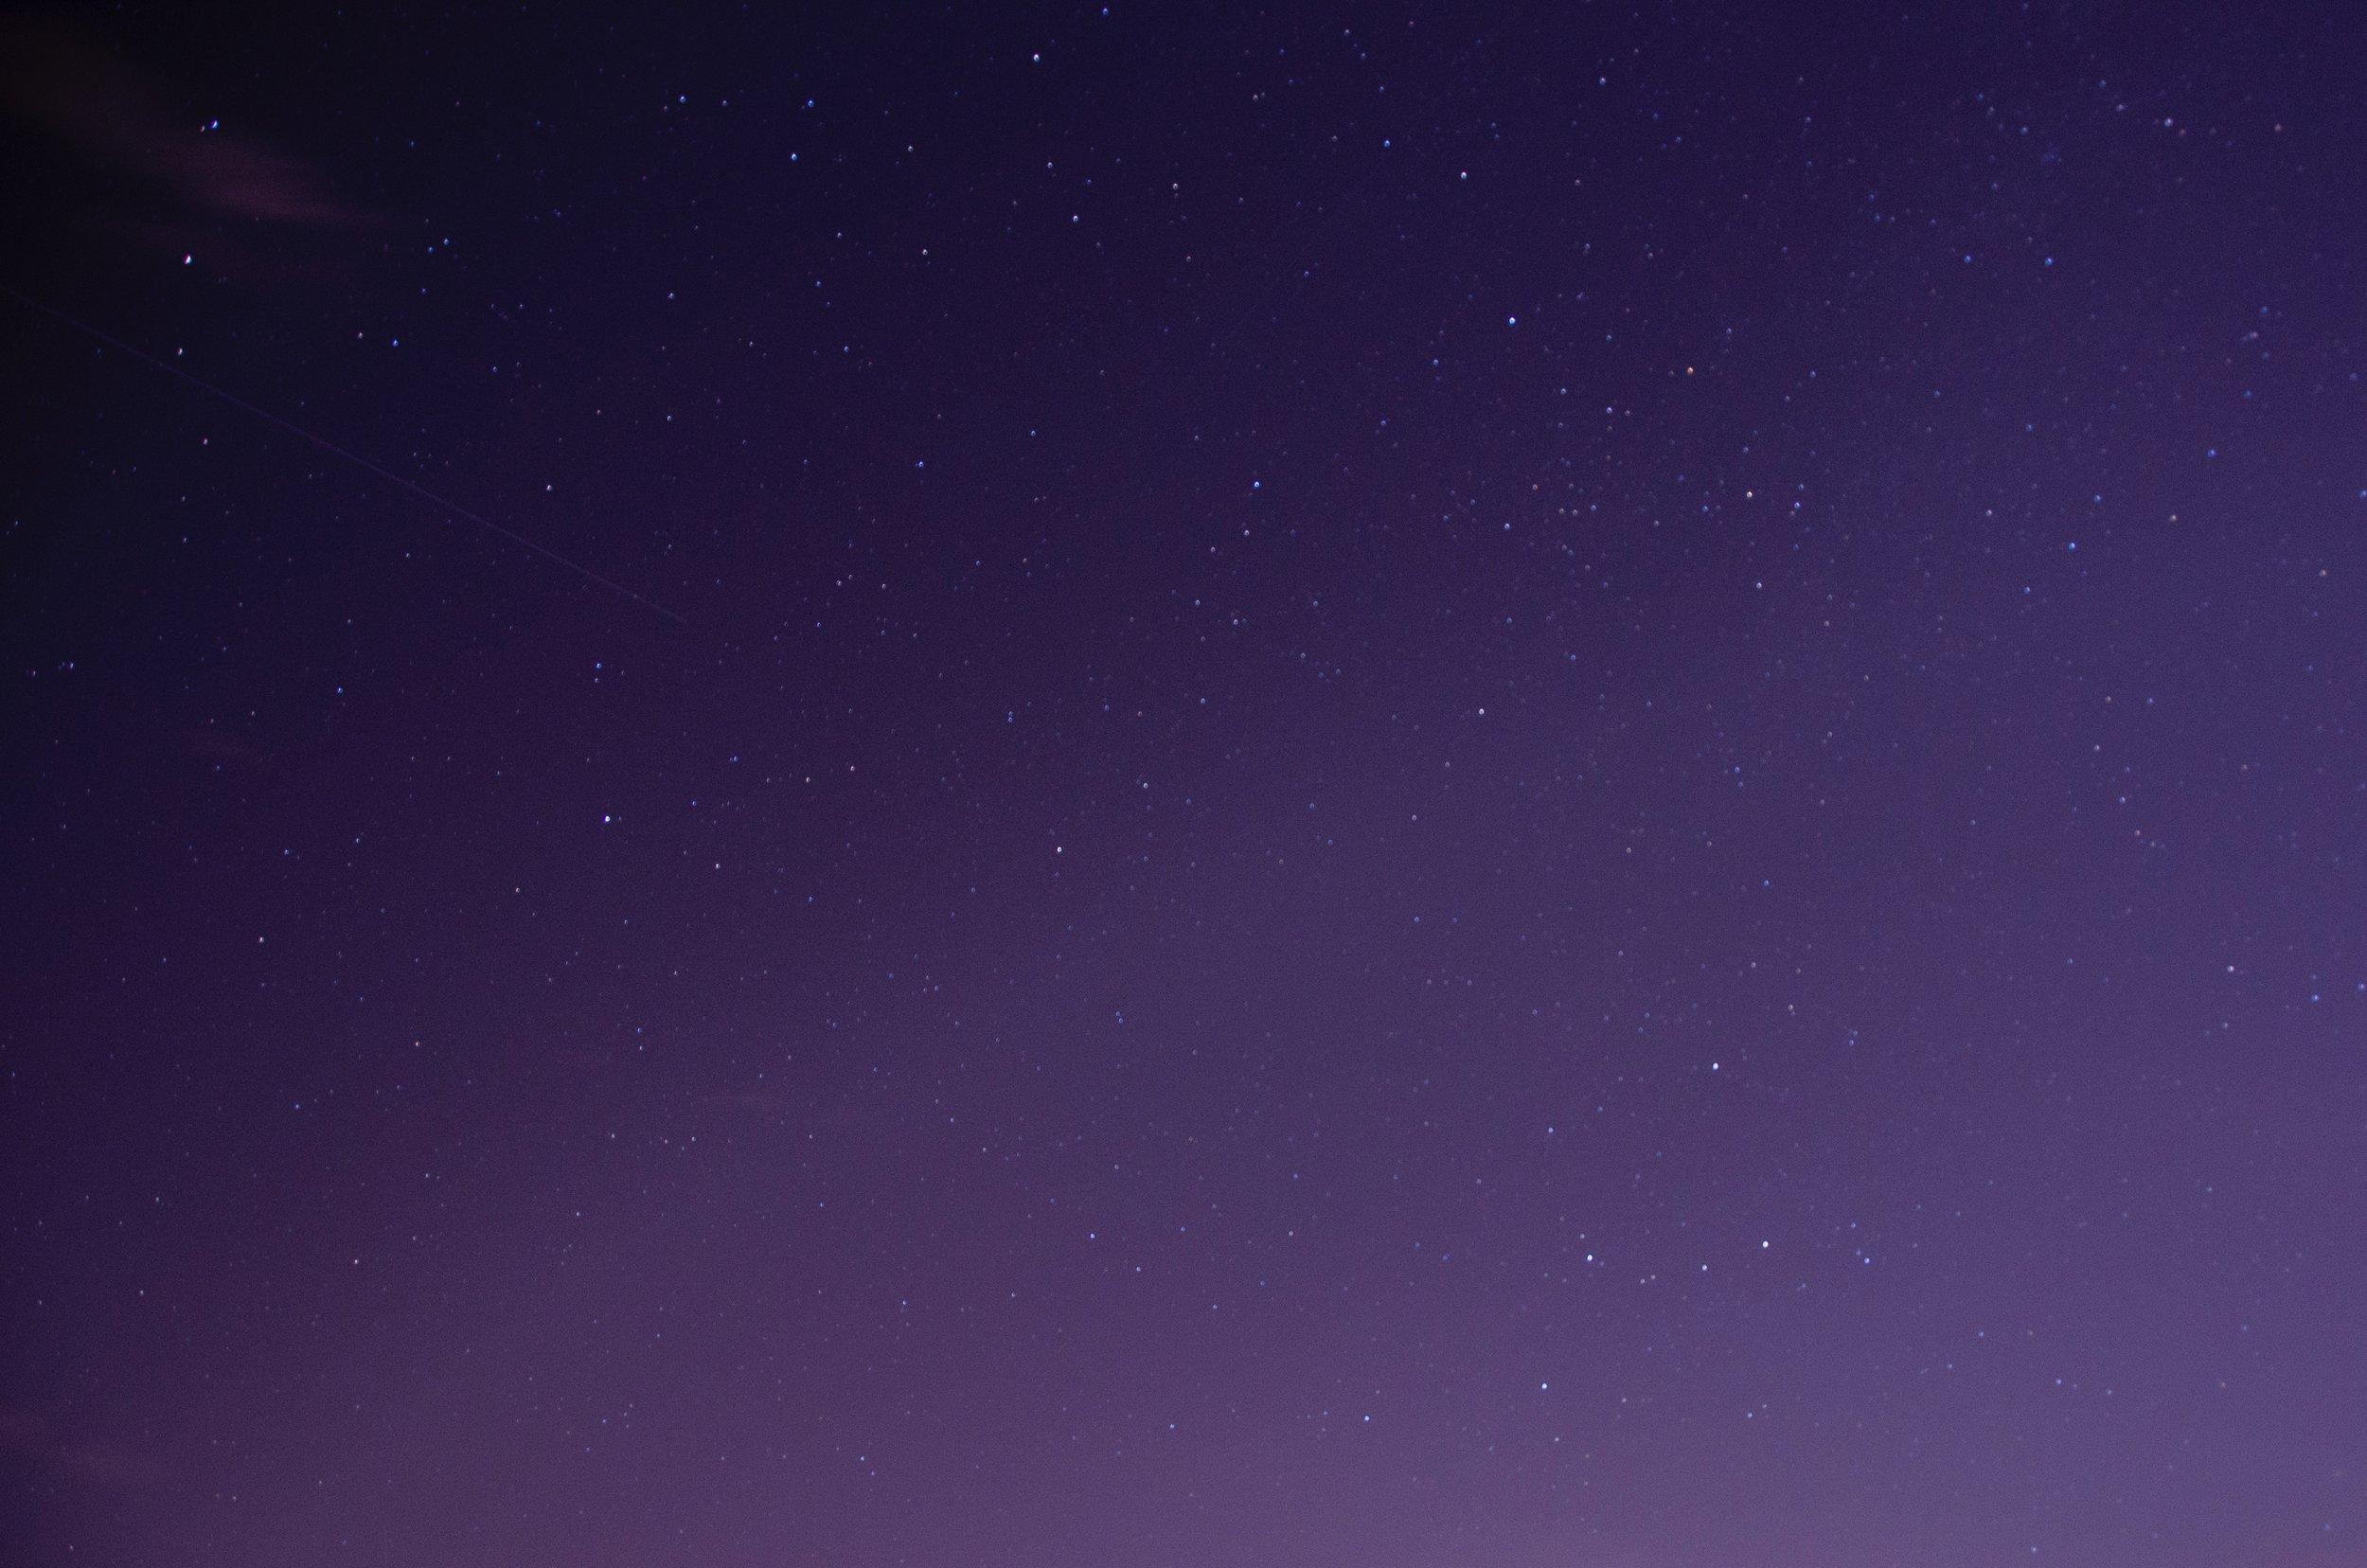 melanie-magdalena-340093-unsplash.jpg